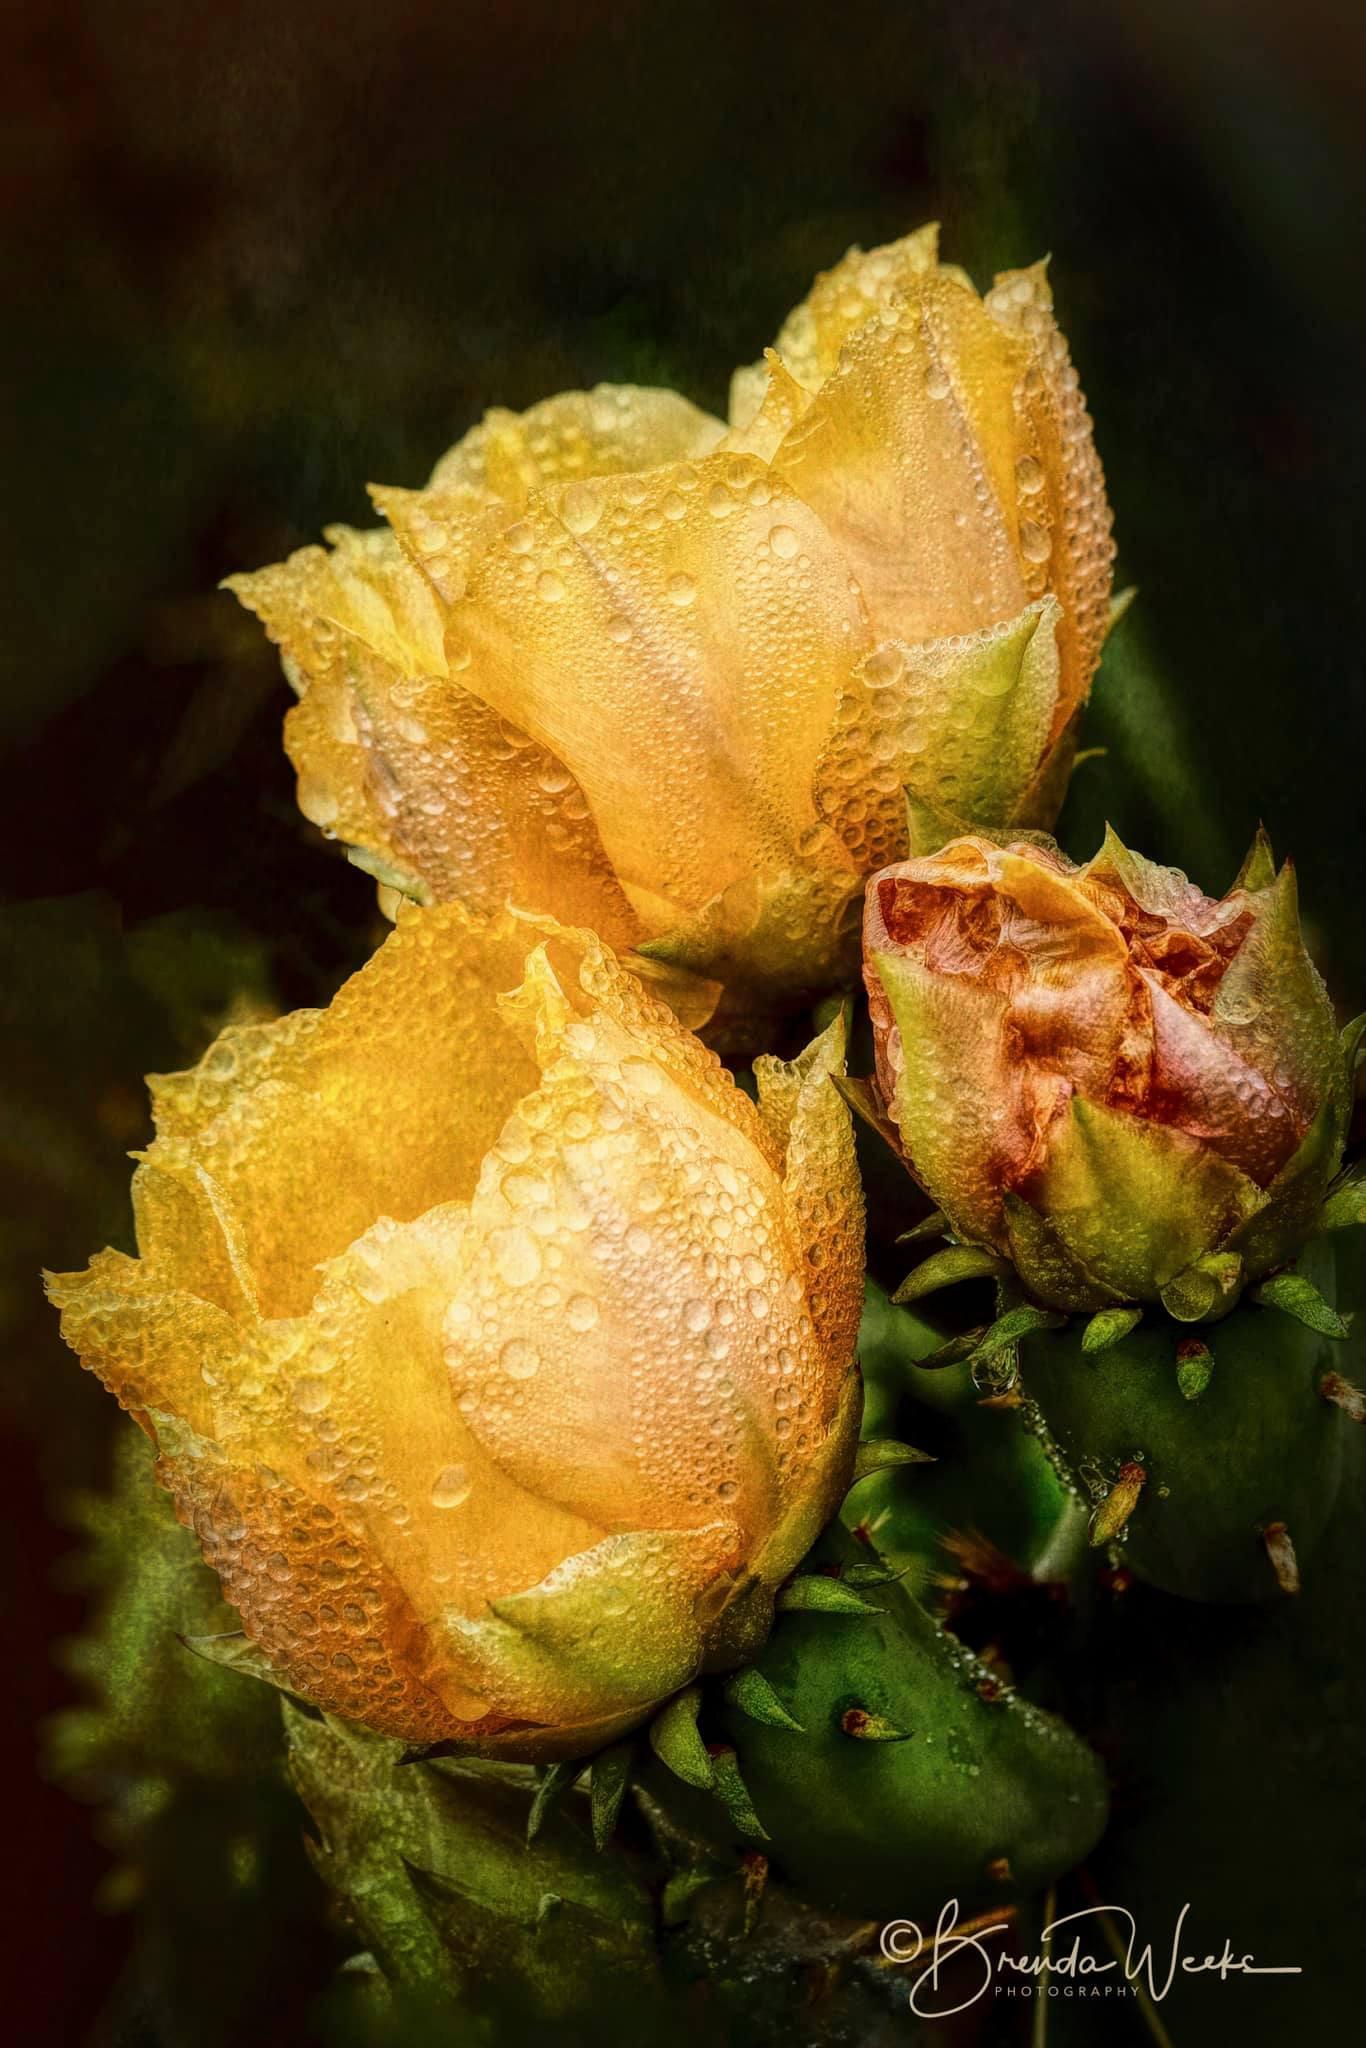 Cactus Blooms with Dew